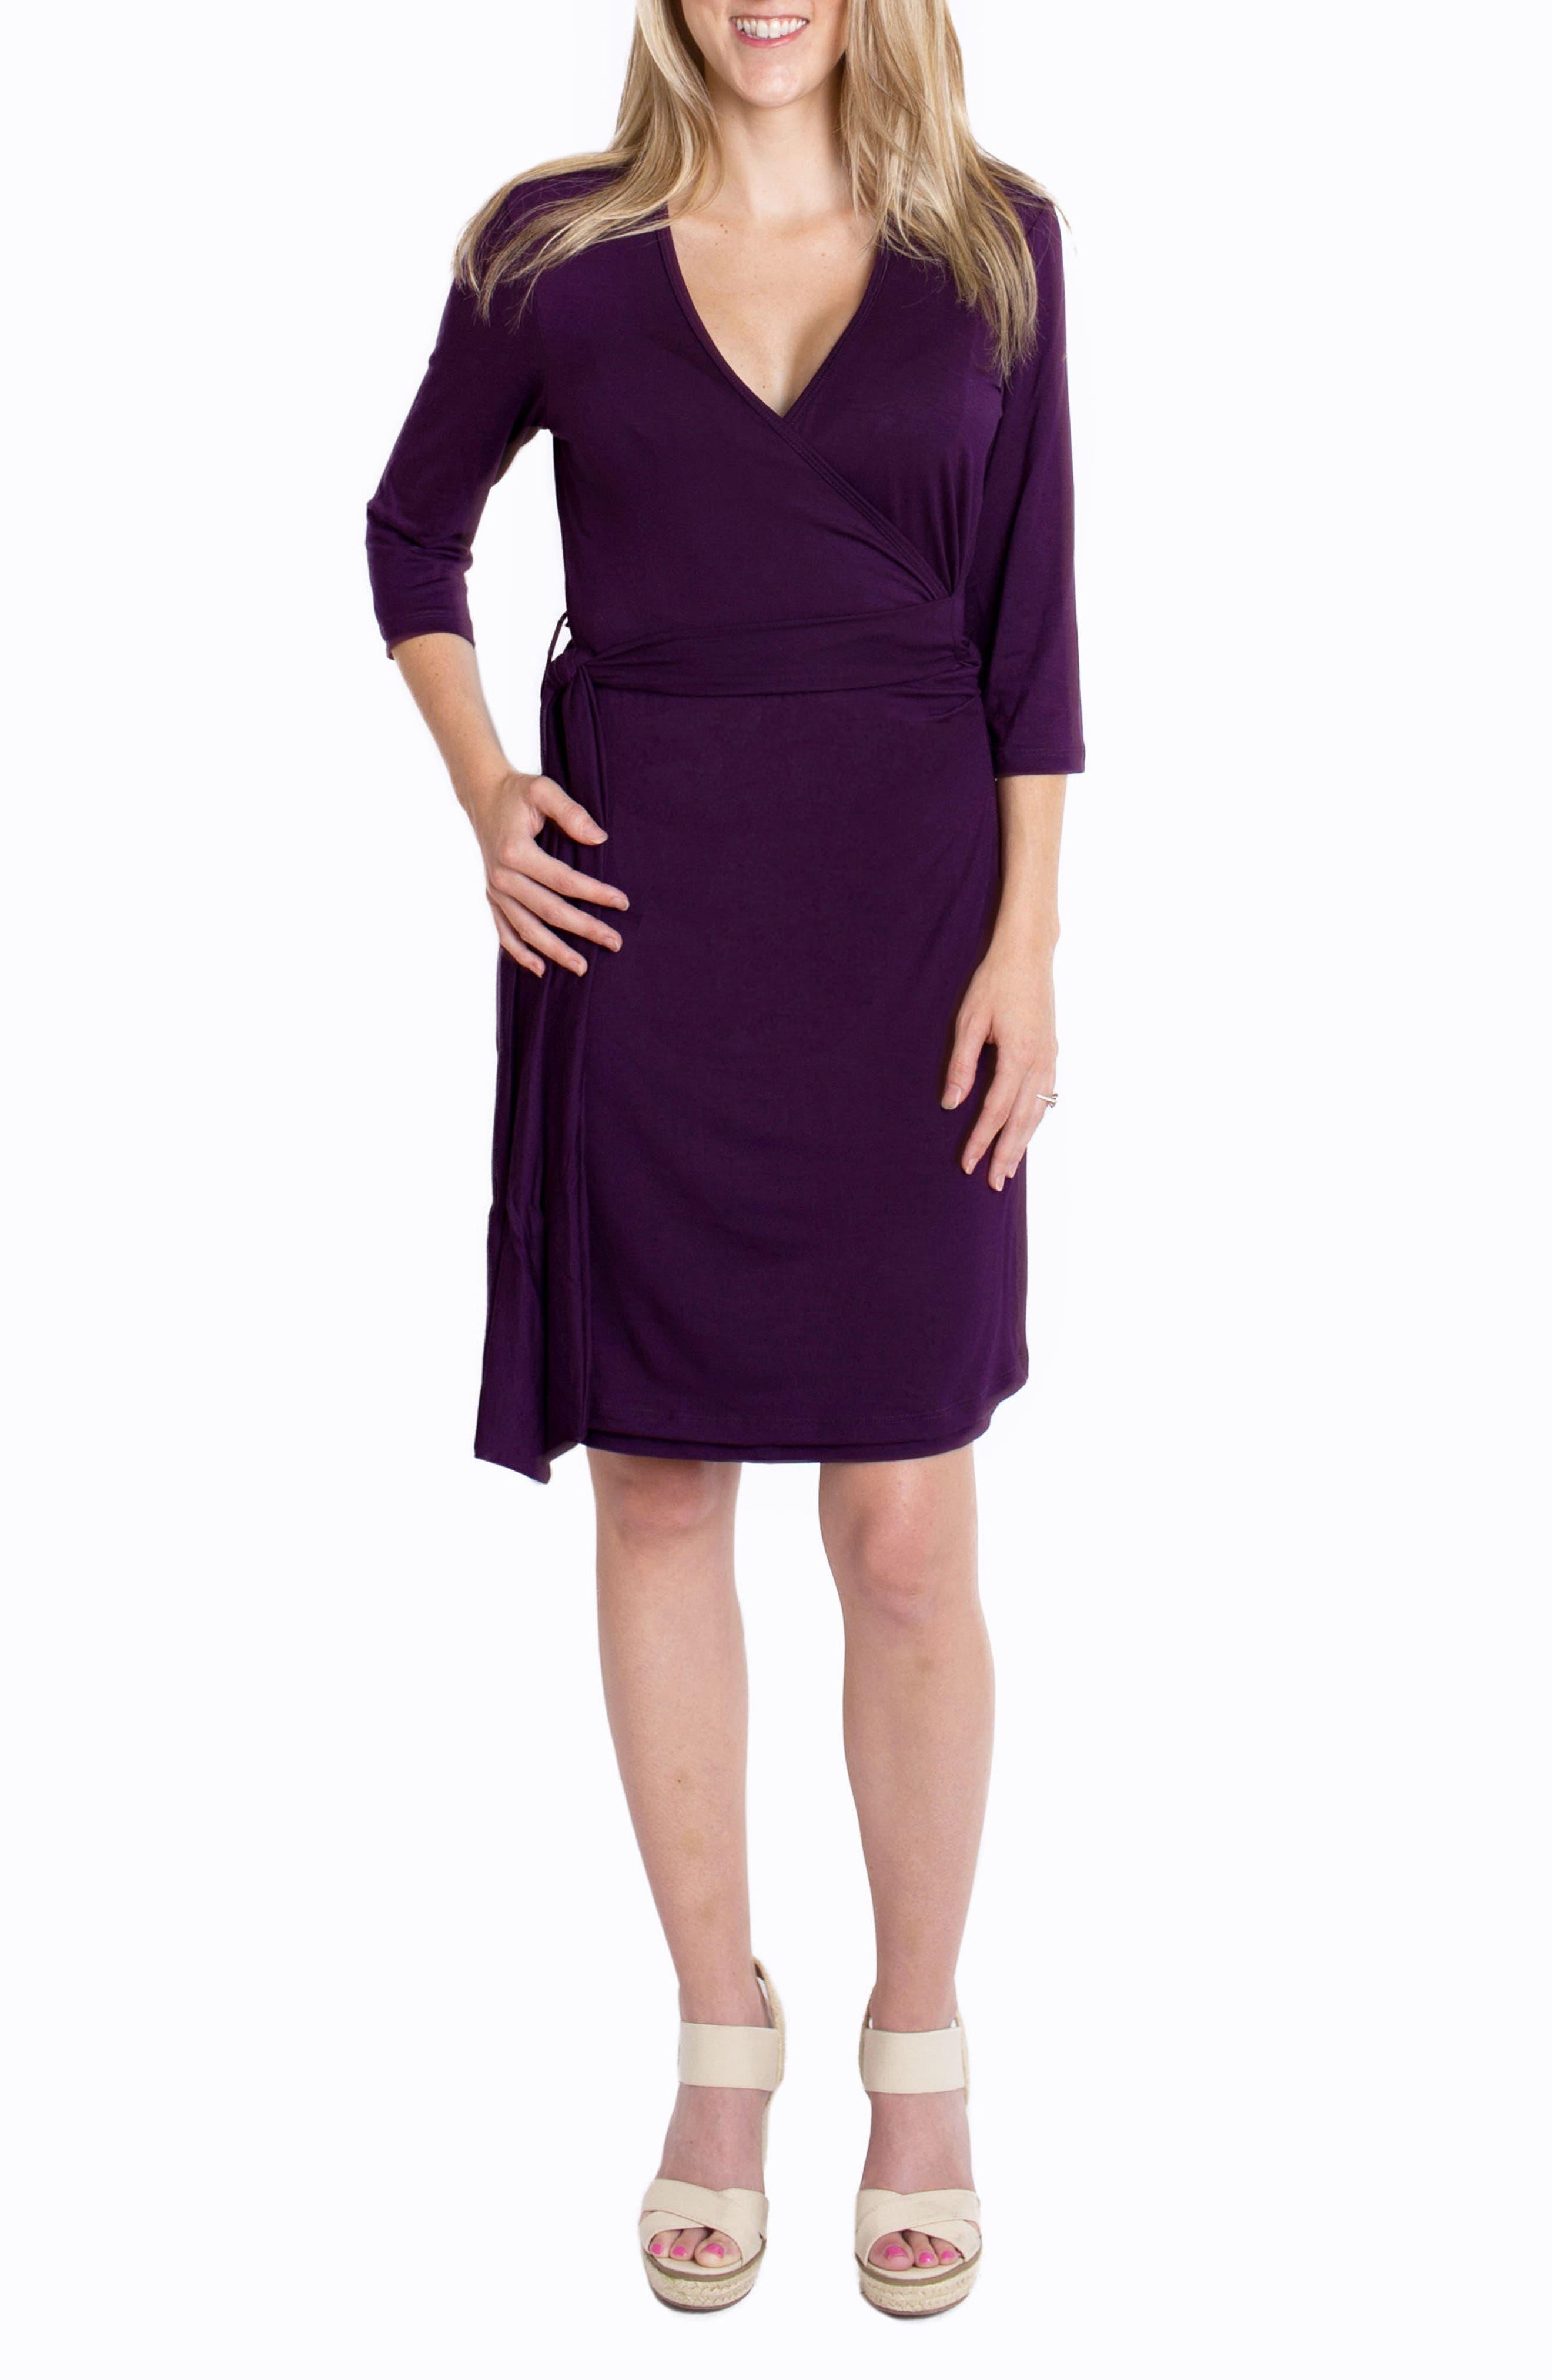 Womens maternity dresses nordstrom udderly hot mama whimsical nursing wrap dress ombrellifo Choice Image